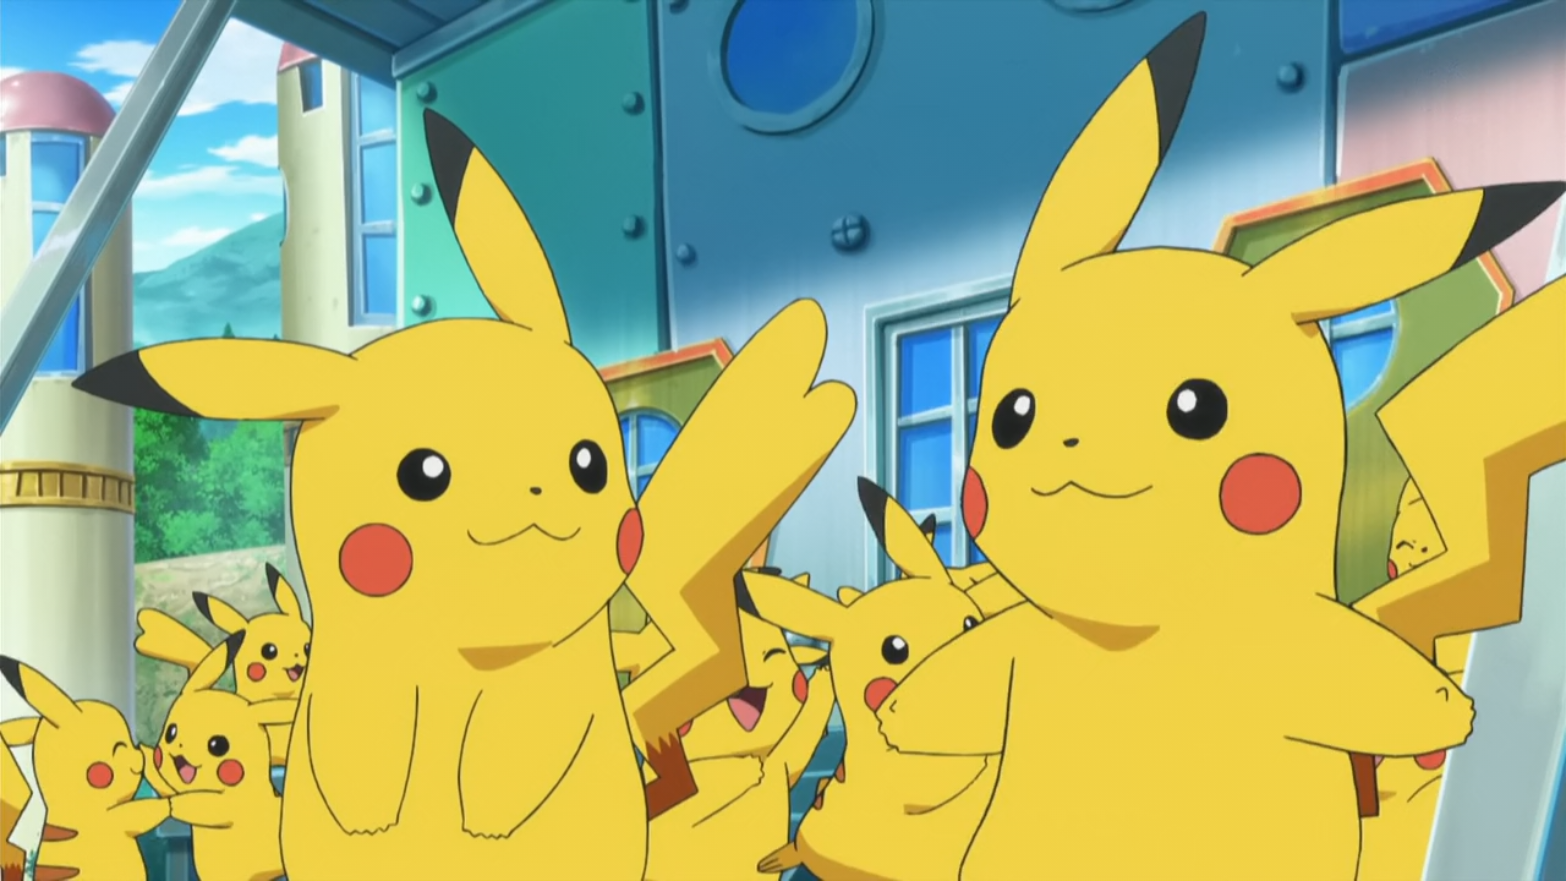 Frank Pikachu